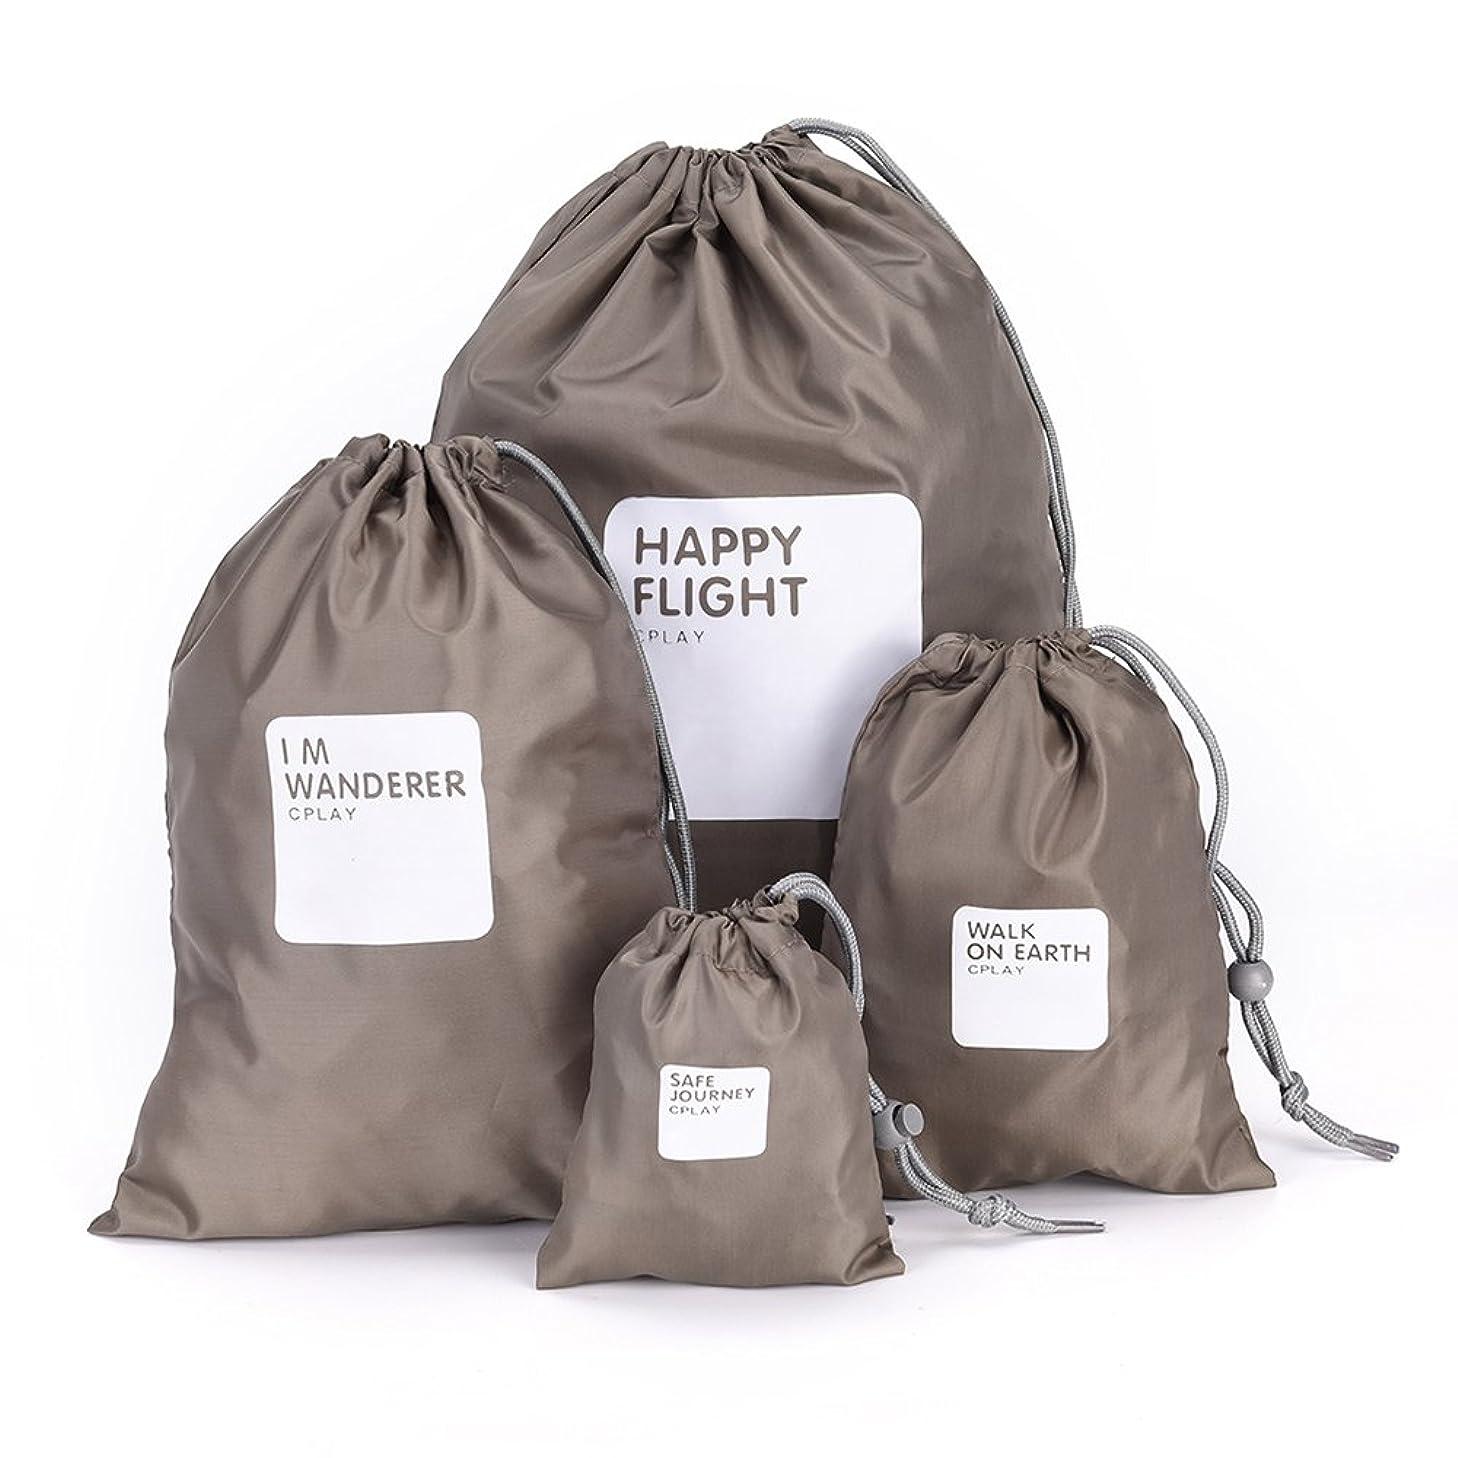 Rakuby 防水バッグ 4点/セット 防水バッグ 収納袋 軽量防水ナイロン 大容量 旅行袋 超軽量 荷物袋 折りたたみ 巾着ポーチ アウトドア ドライサック キャンプ用 ハイキング 服クラシファイド シューズ